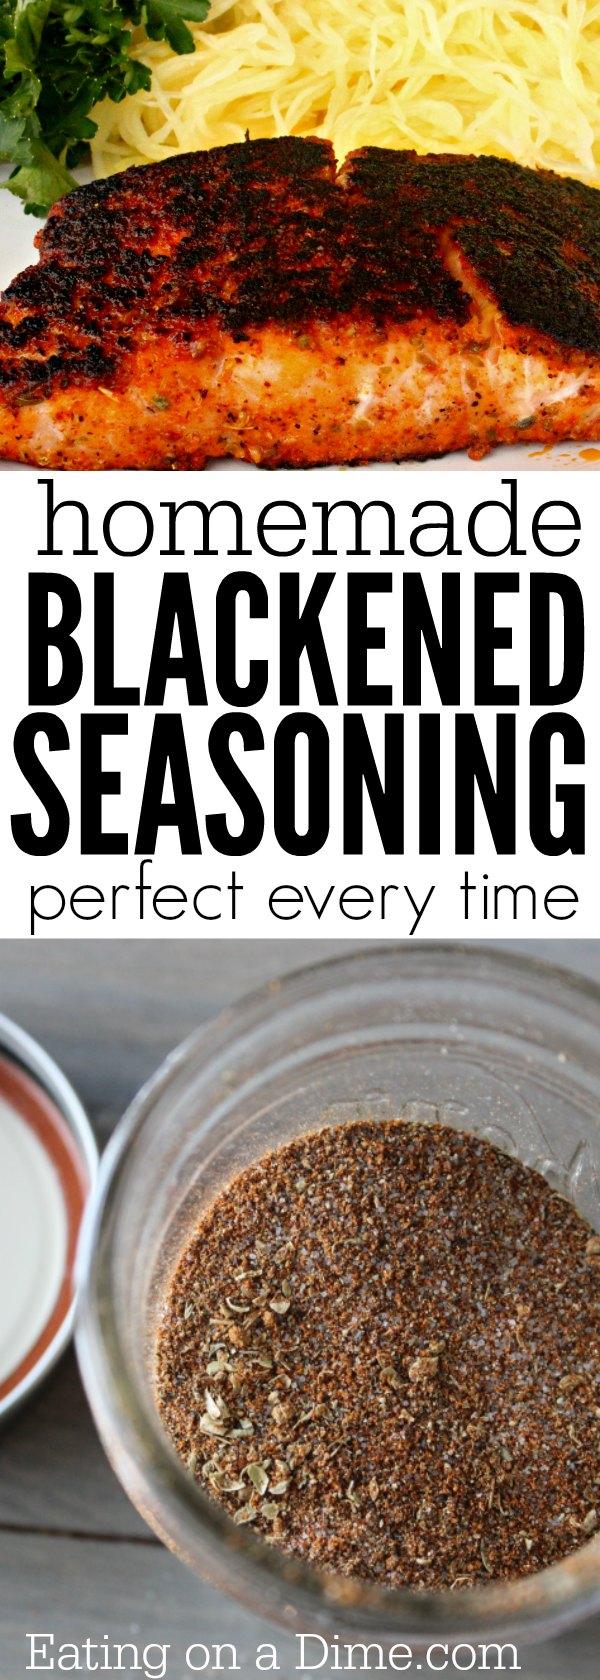 Homemade blackened seasoning recipe eating on a dime for Fish seasoning recipe